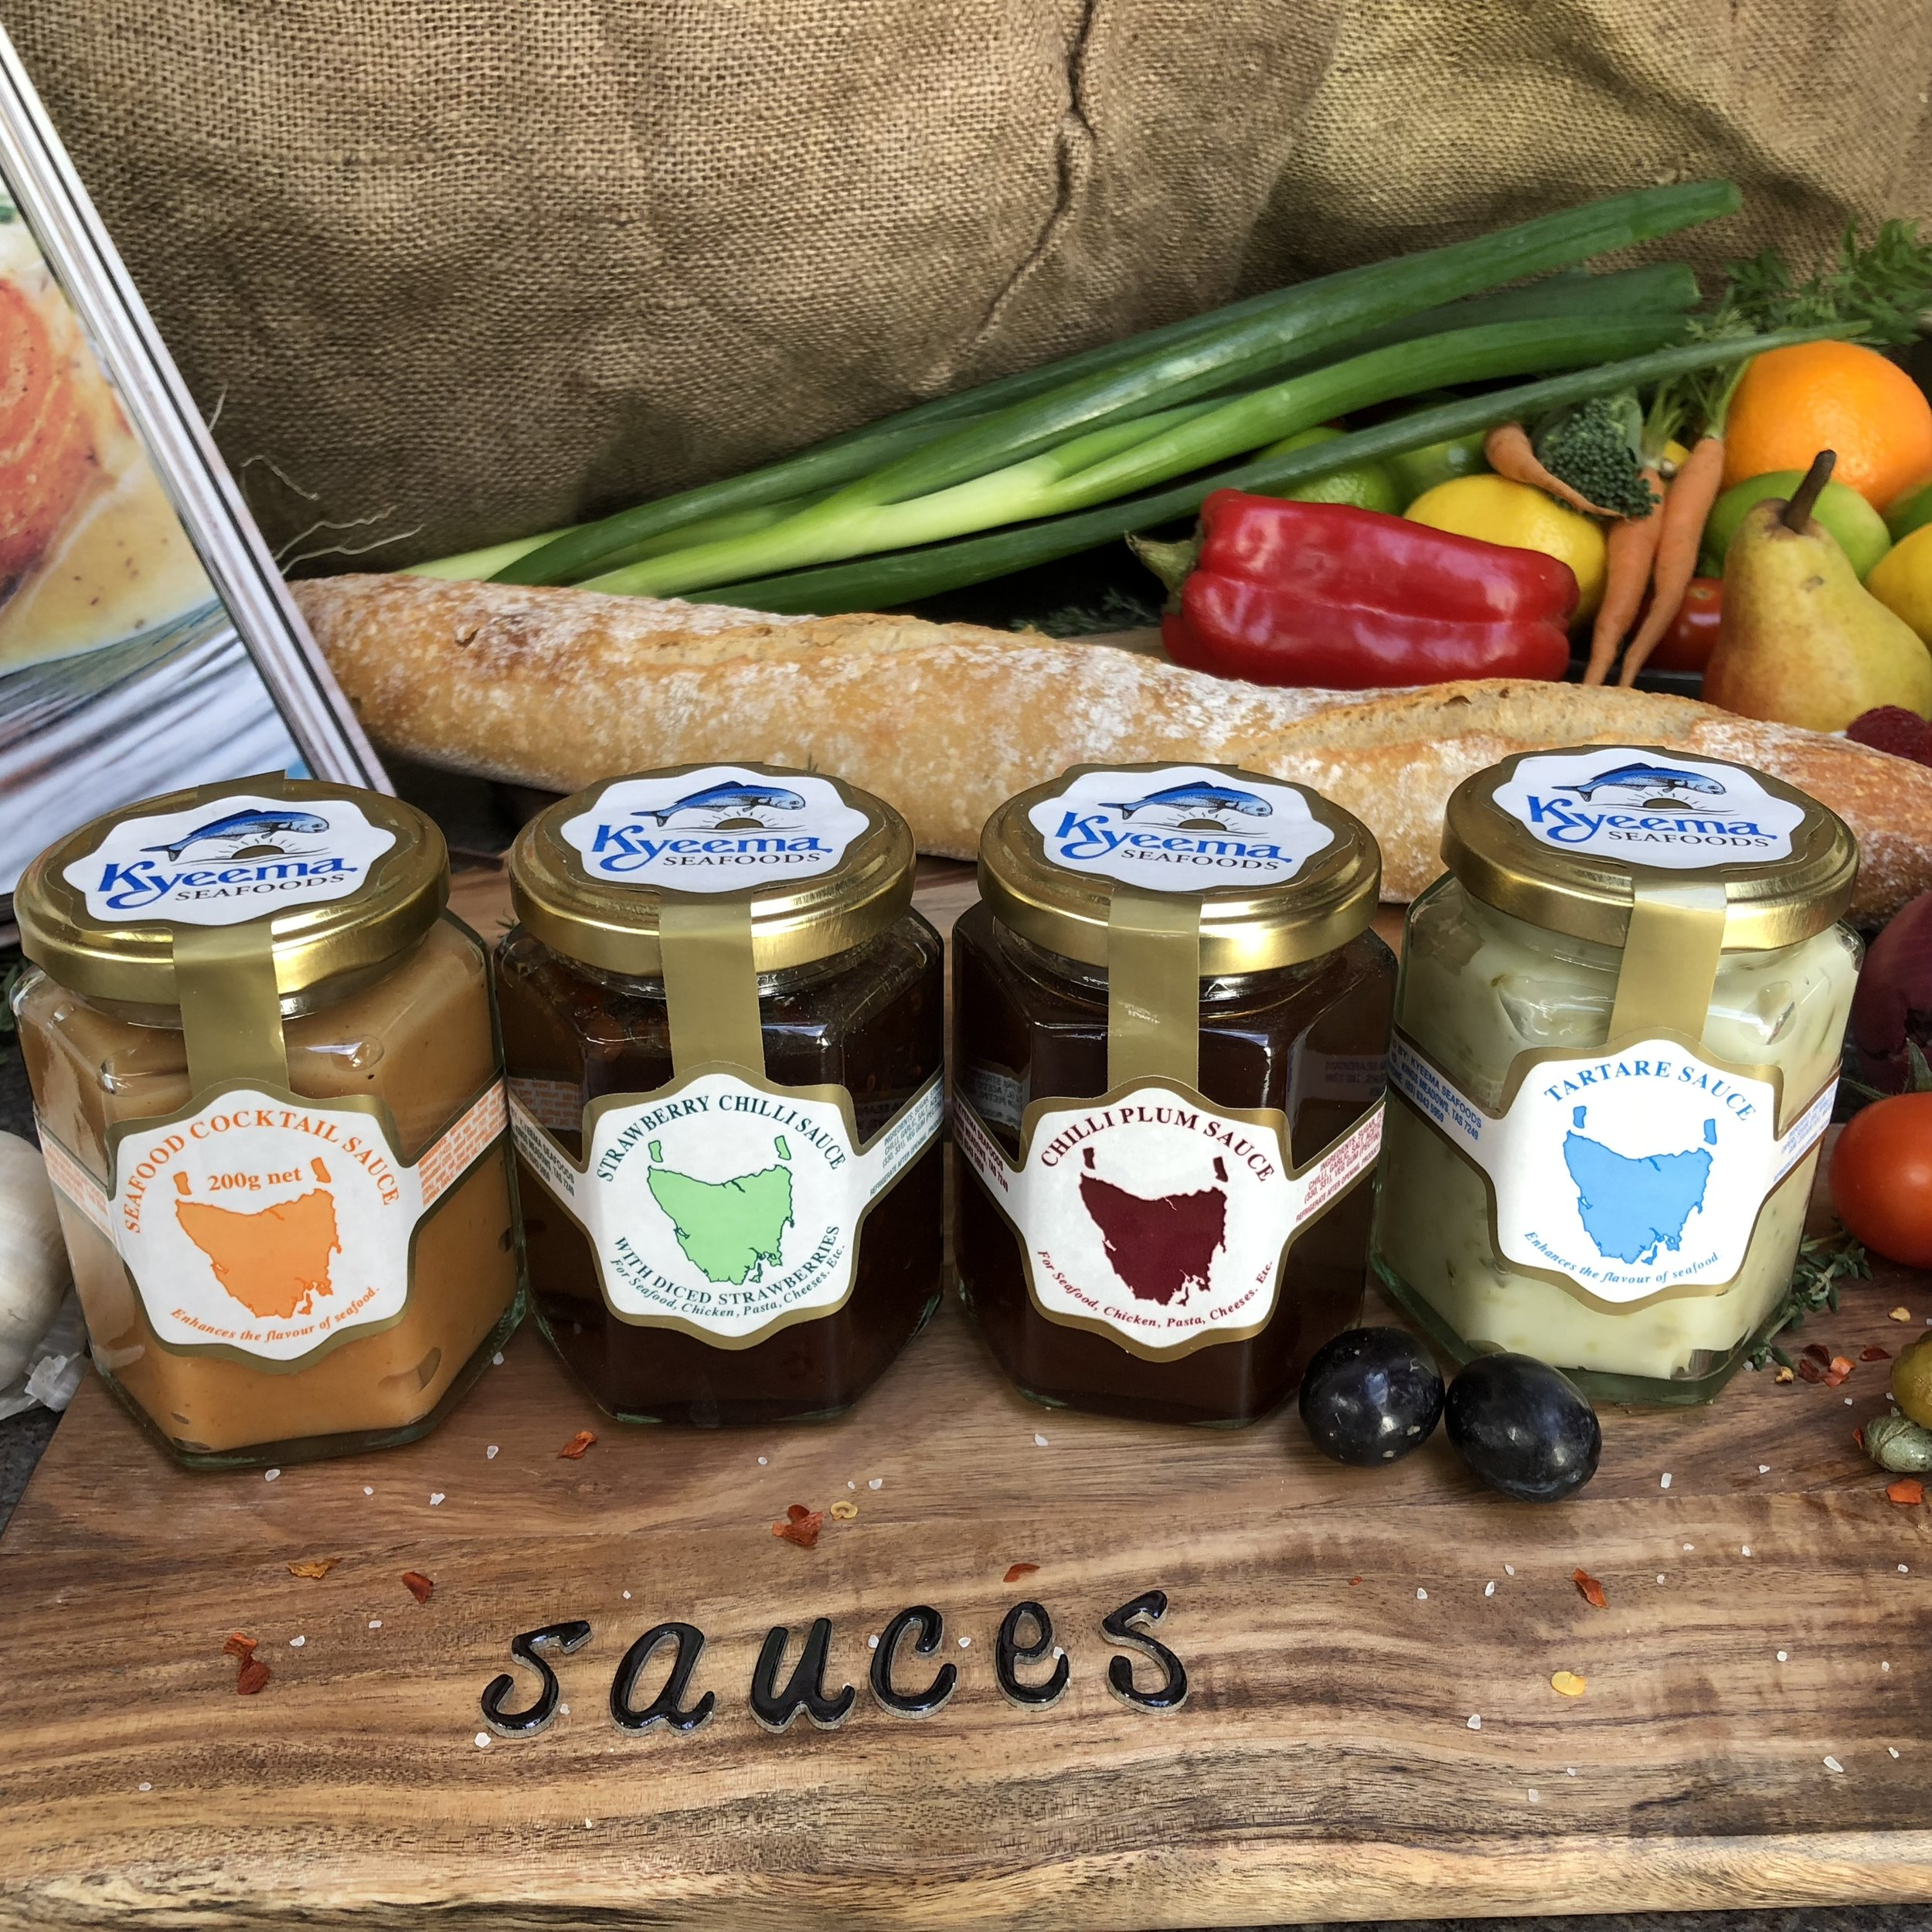 Sauces and Jams